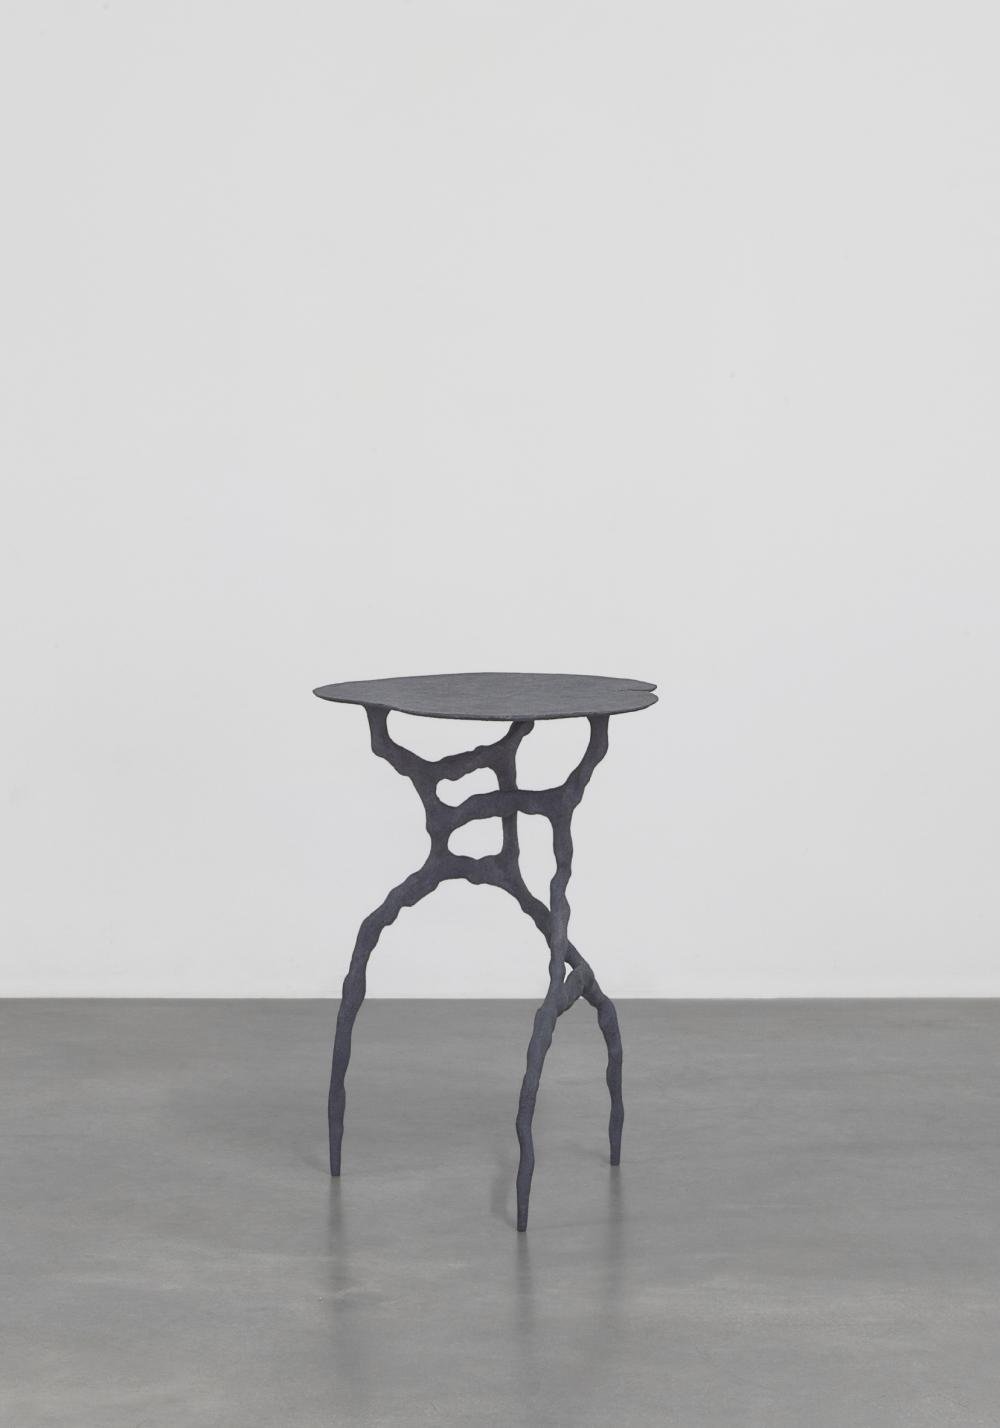 Art furniture The best Art furniture by Charles Trevelyan The best Art furniture by Charles Trevelyan I Lobo you9